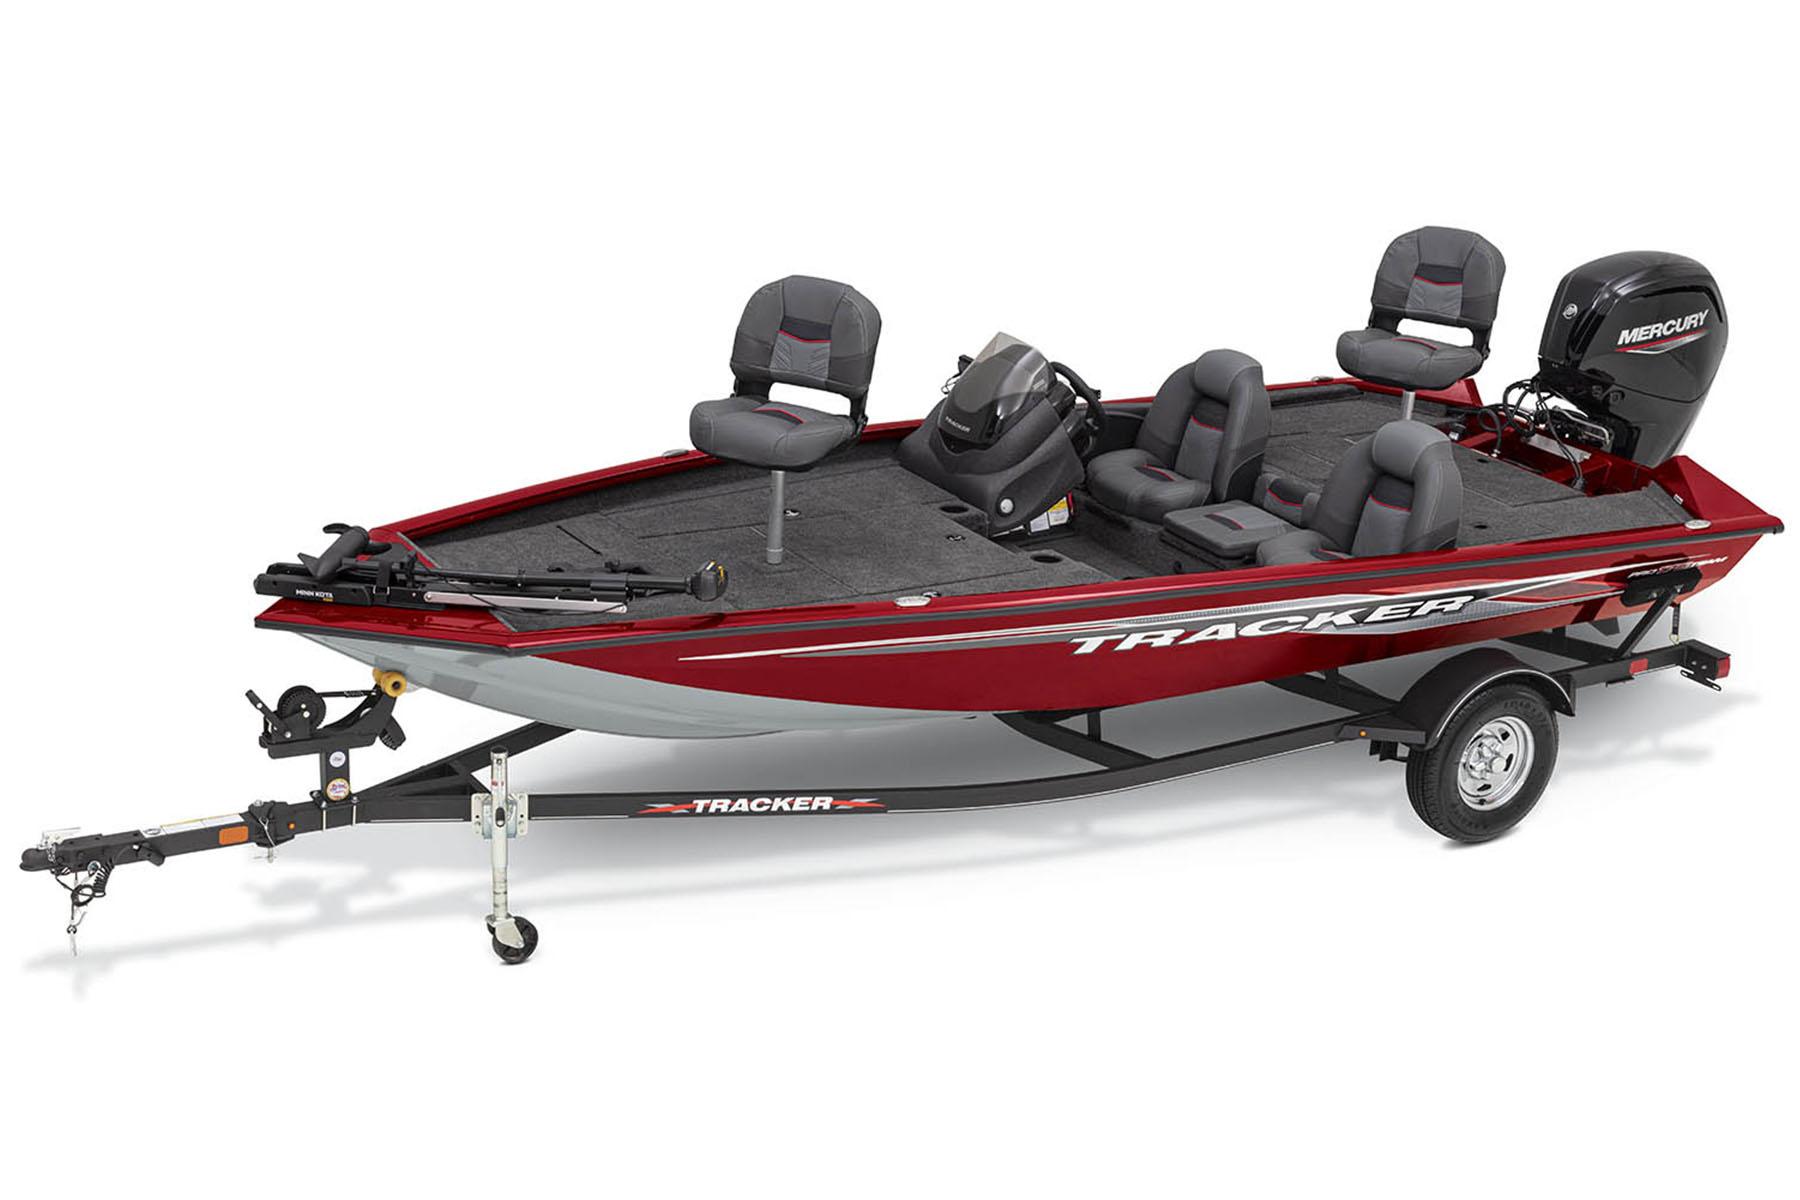 PRO TEAM 175 TXW - TRACKER Mod V Bass Boat   Bass Tracker 170 Wiring Chart      Tracker Boats